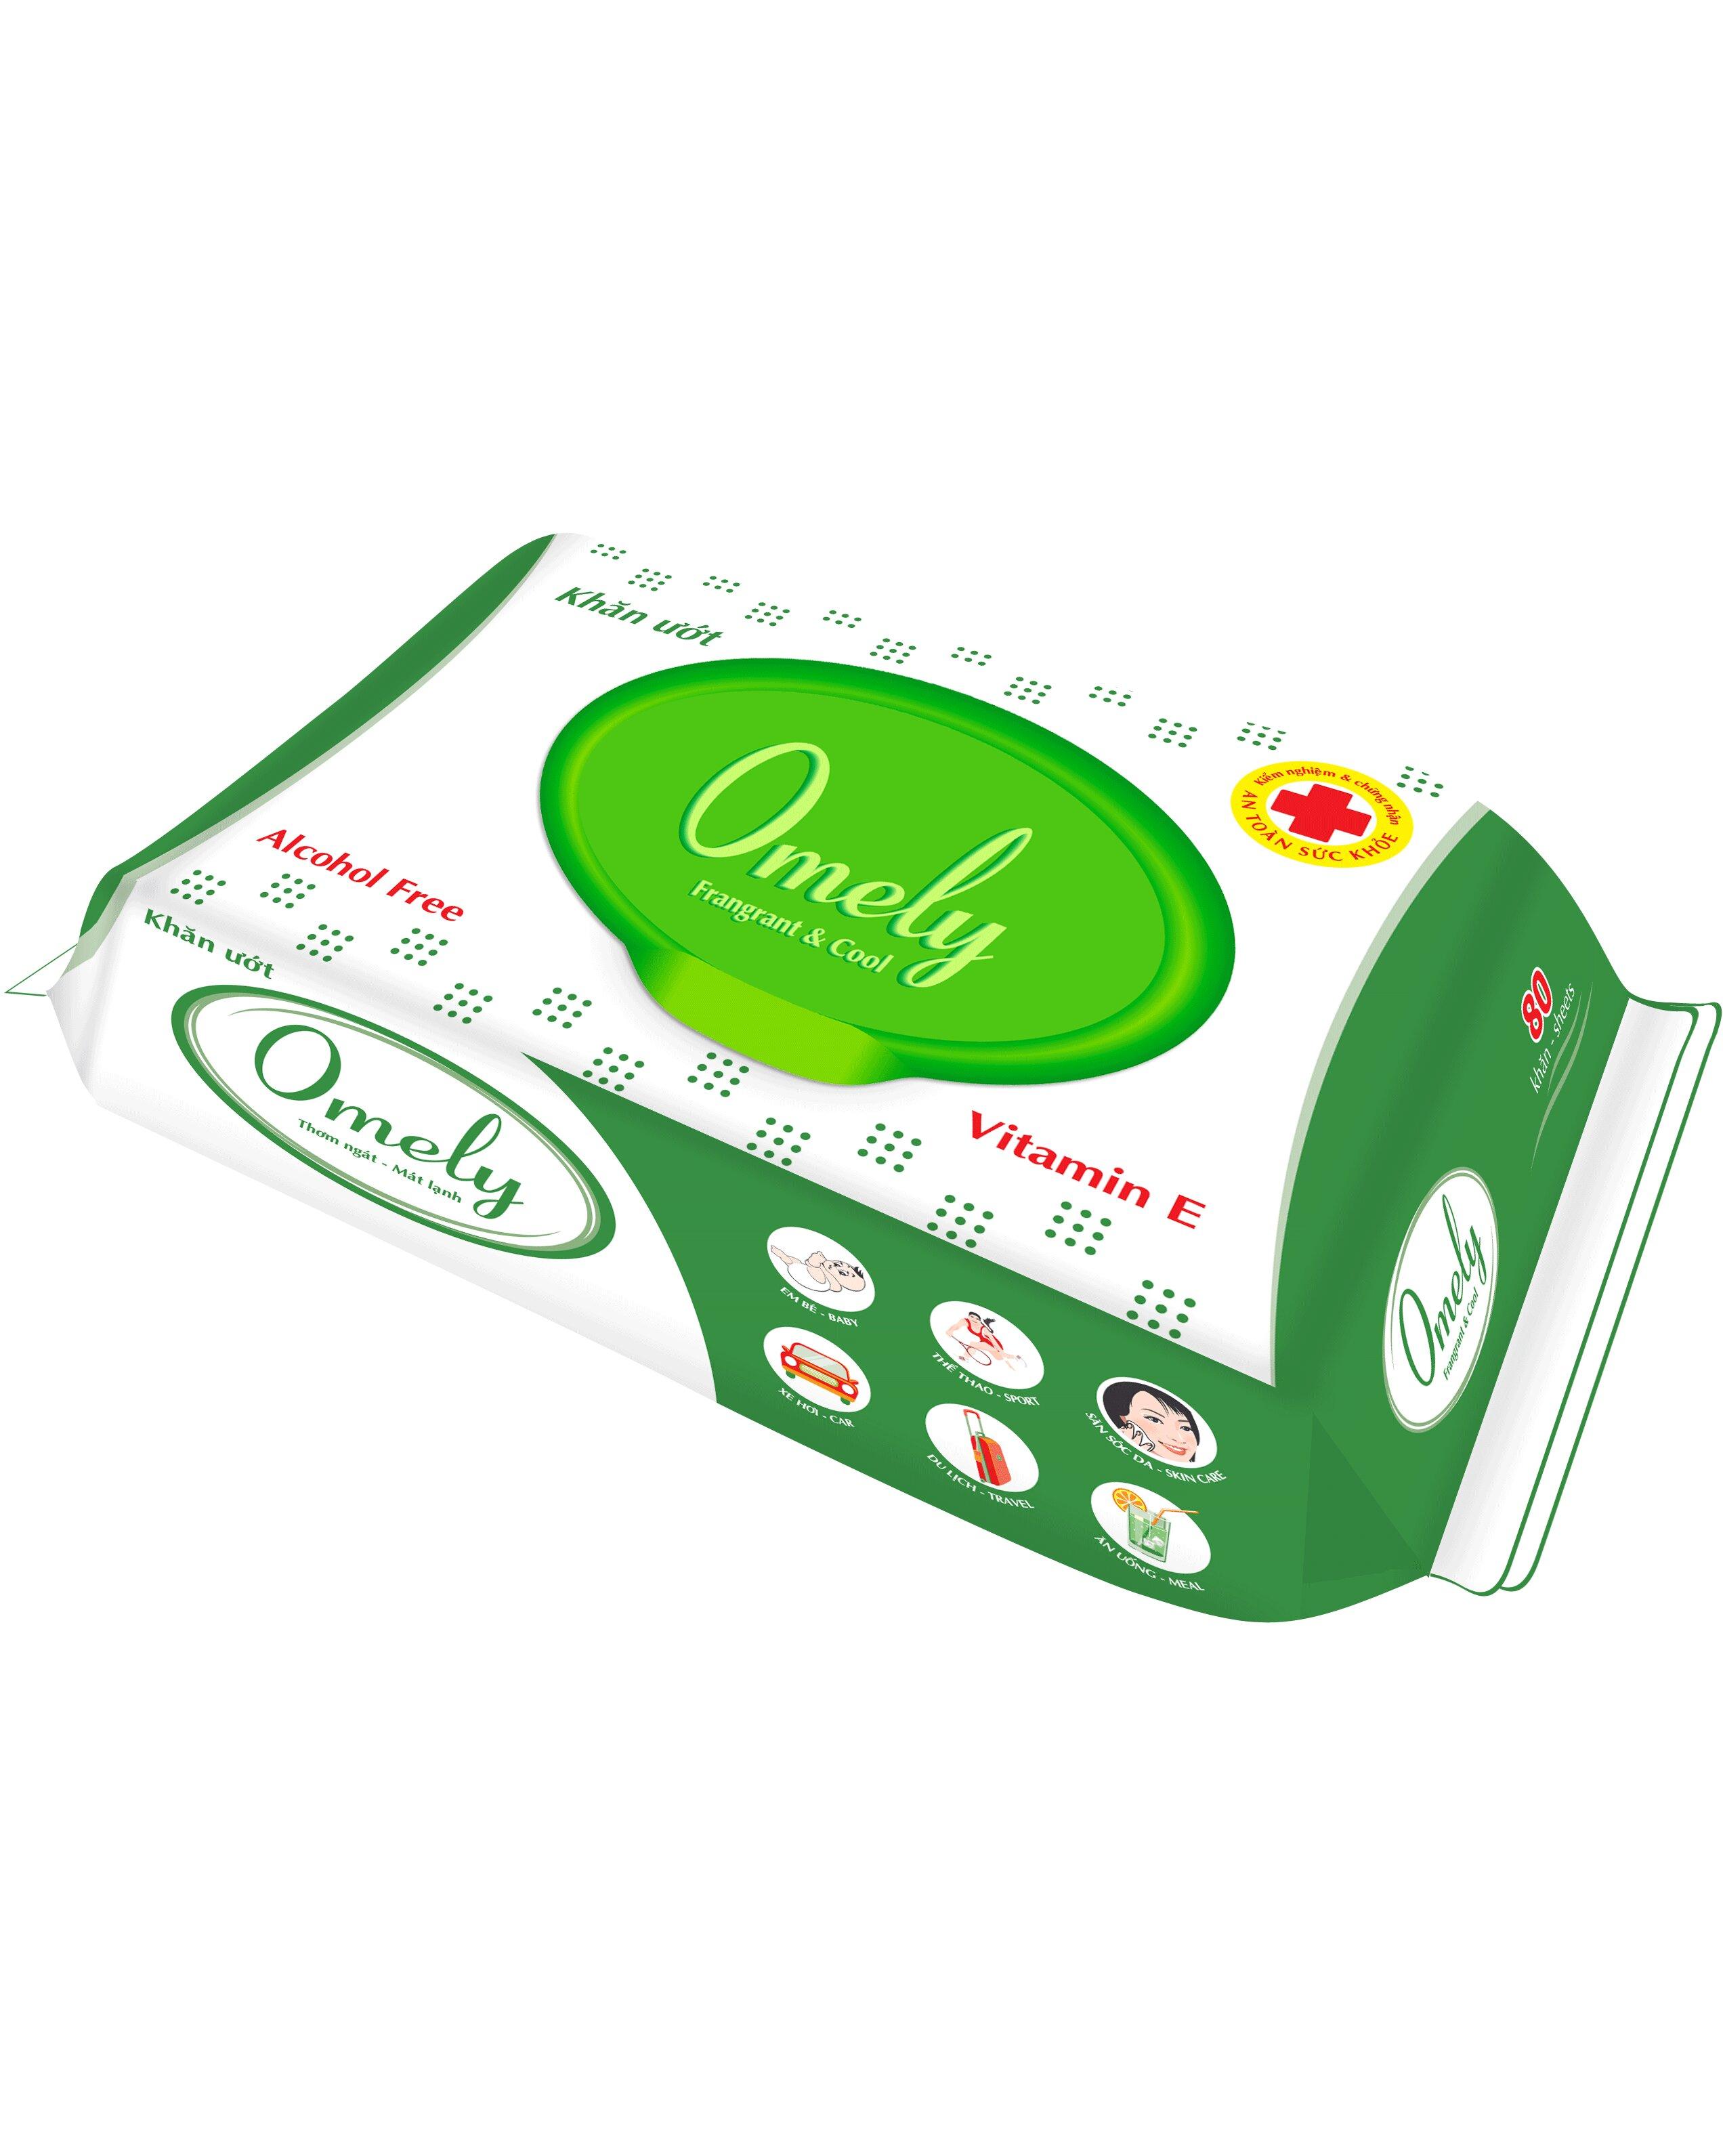 Khăn ướt Omely 4205 chứa vitamin E